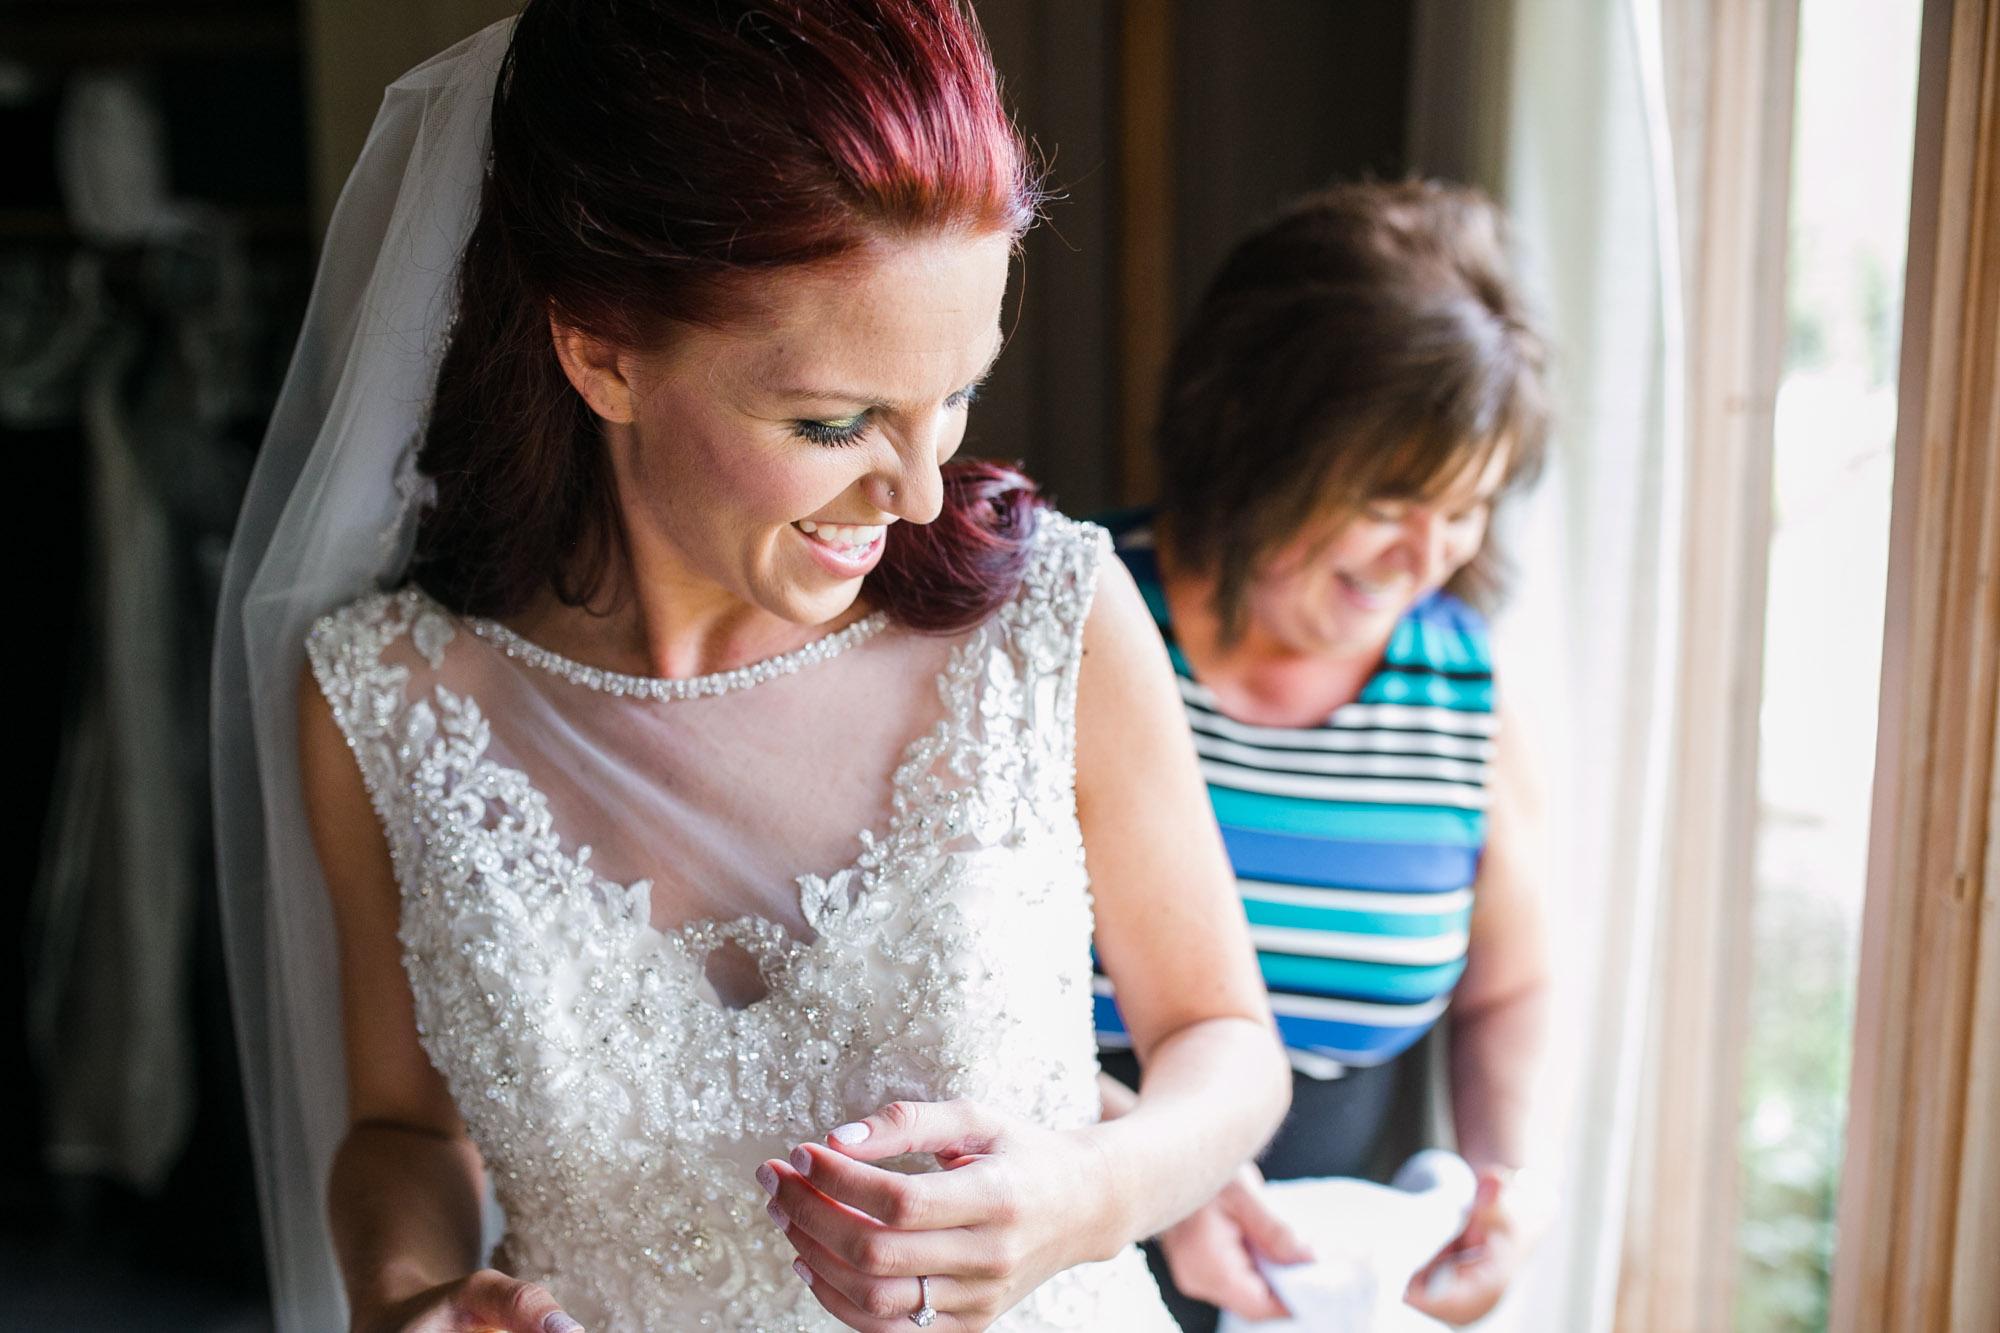 hensville-wedding-downtown-toledo-ohio (11 of 103).jpg